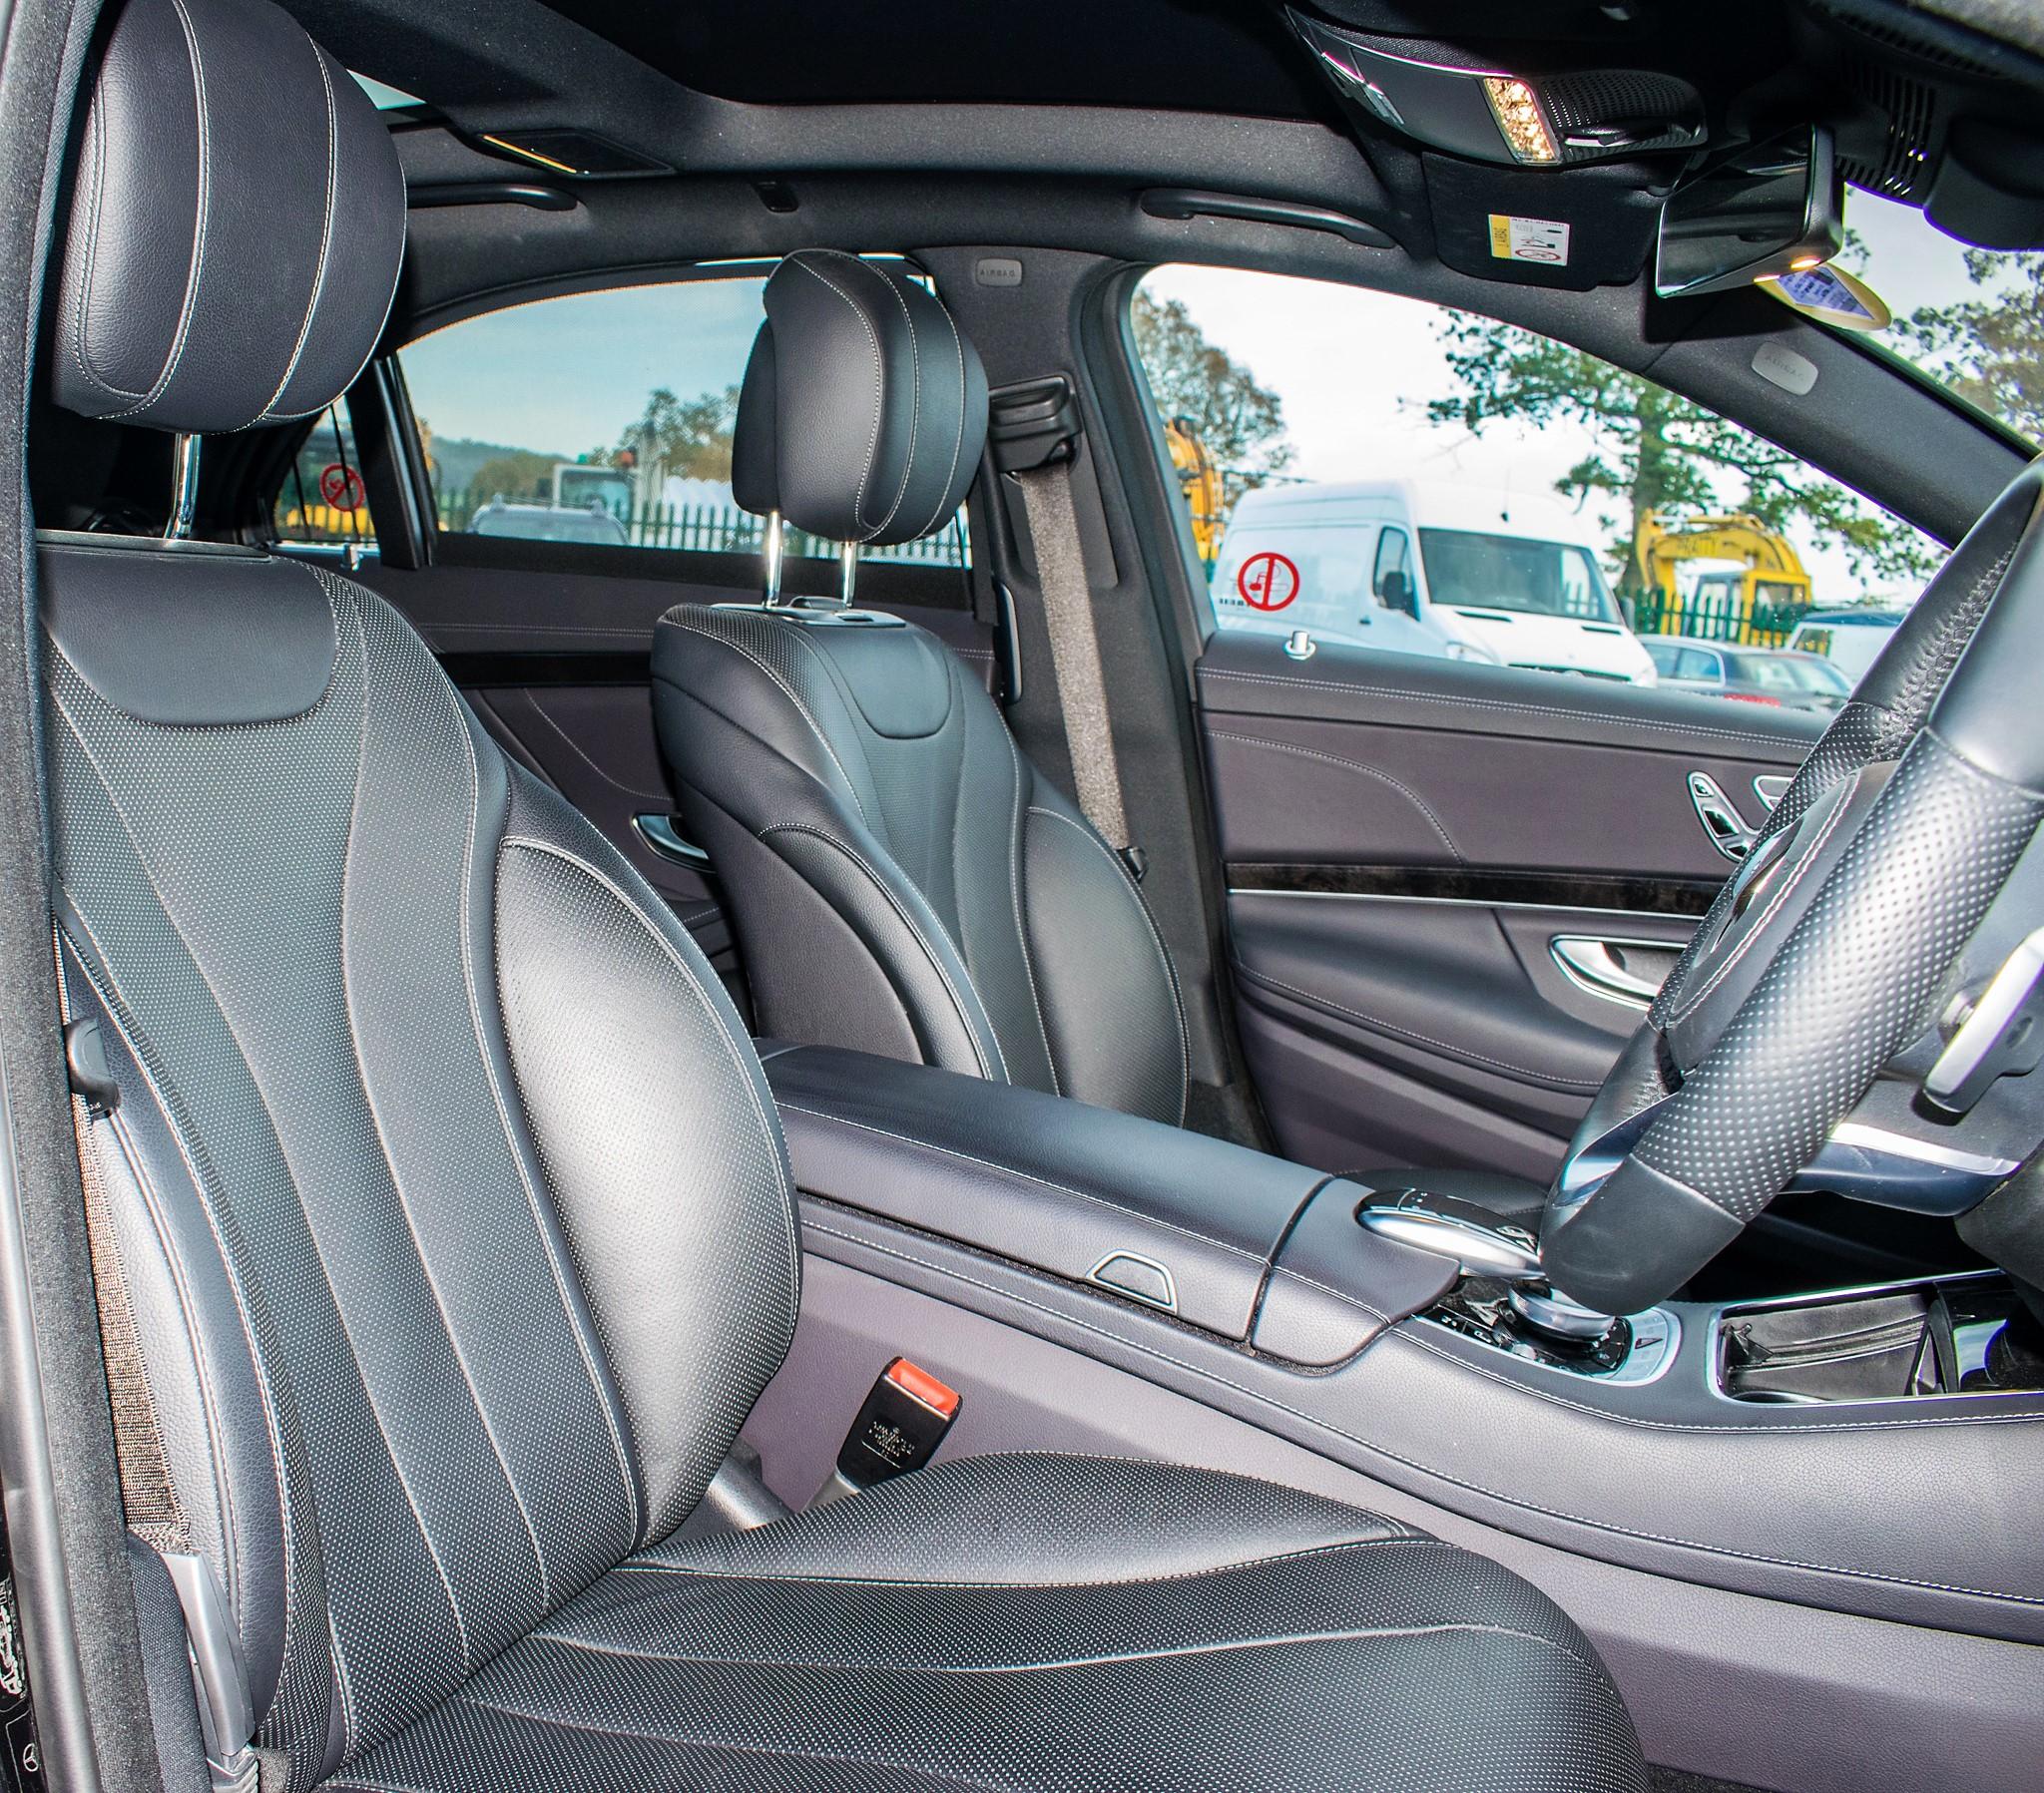 Mercedes Benz S450 L AMG Line Executive auto petrol 4 door saloon car Registration Number: FX68 - Image 20 of 33